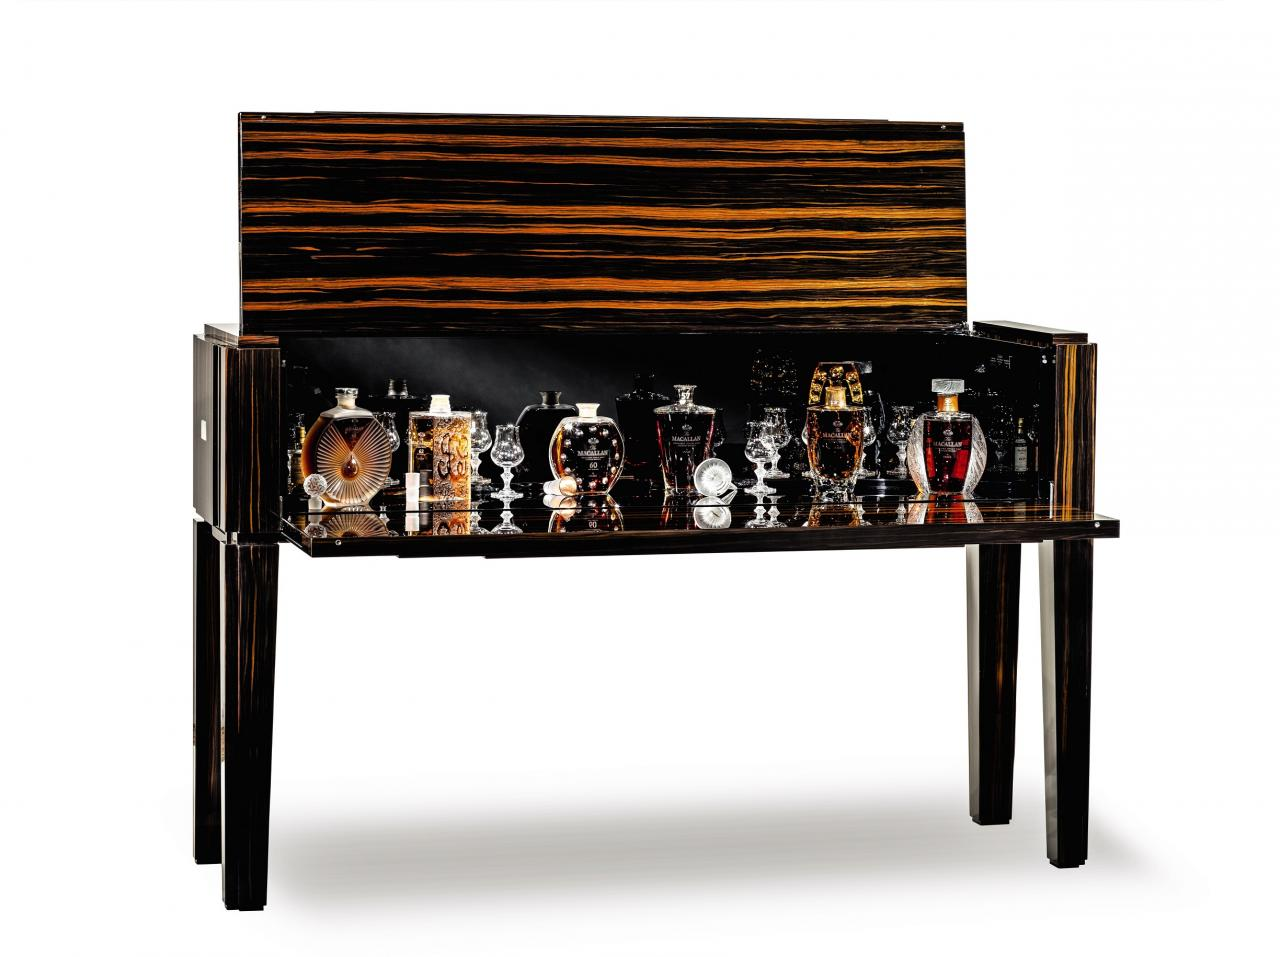 「The Macallan in Lalique——鑒賞珍傳版」以987,994美元於香港蘇富比成交,創下「單項威士忌拍品」世界拍賣紀錄。